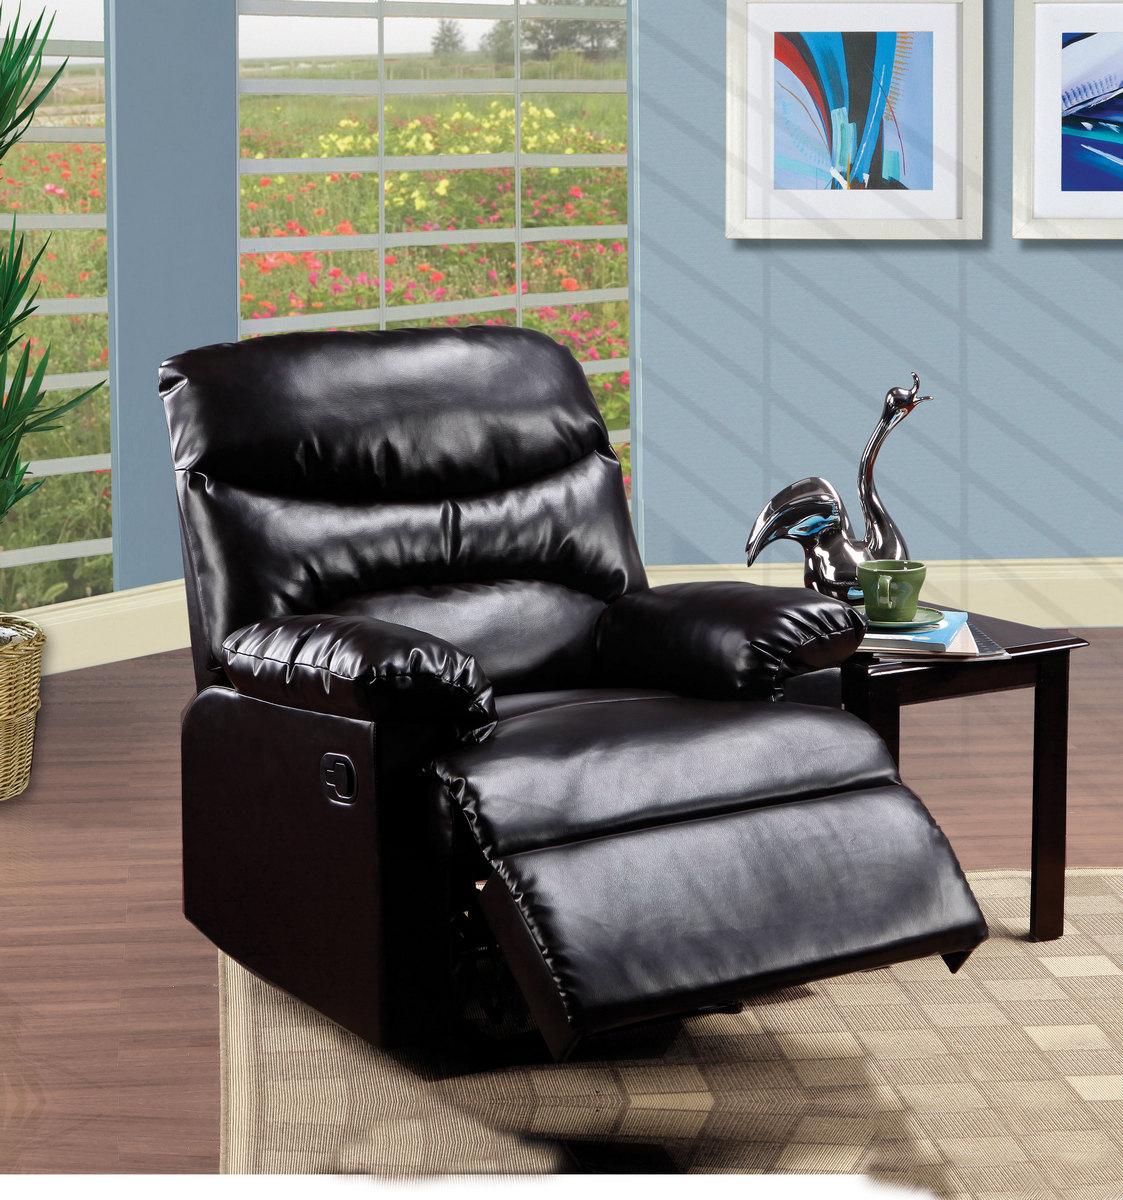 Arcadia Recliner Motion in Espresso PU Acme Furniture 59010